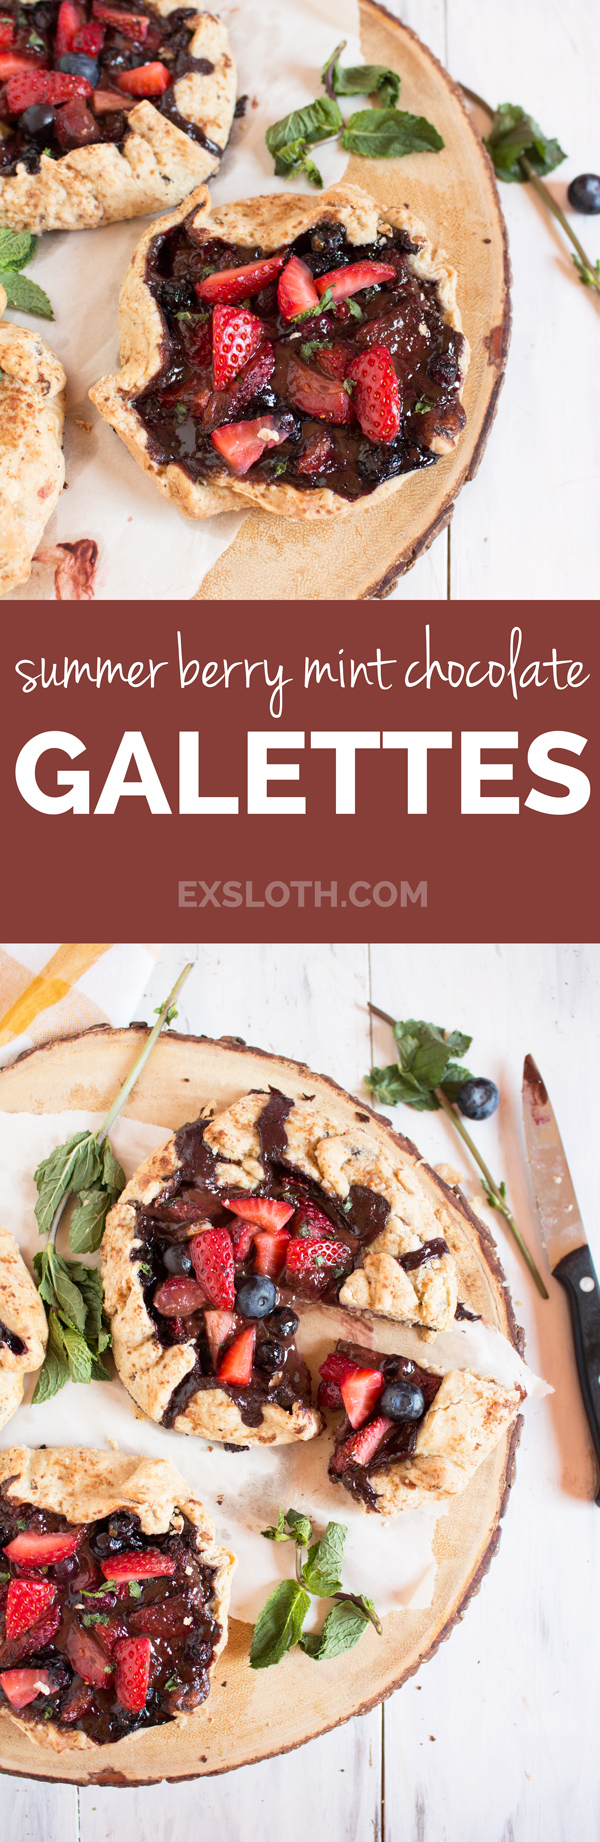 Vegan Summer Berry Mint Chocolate Galette (made with spelt flour and fresh mint) via @ExSloth | ExSloth.com